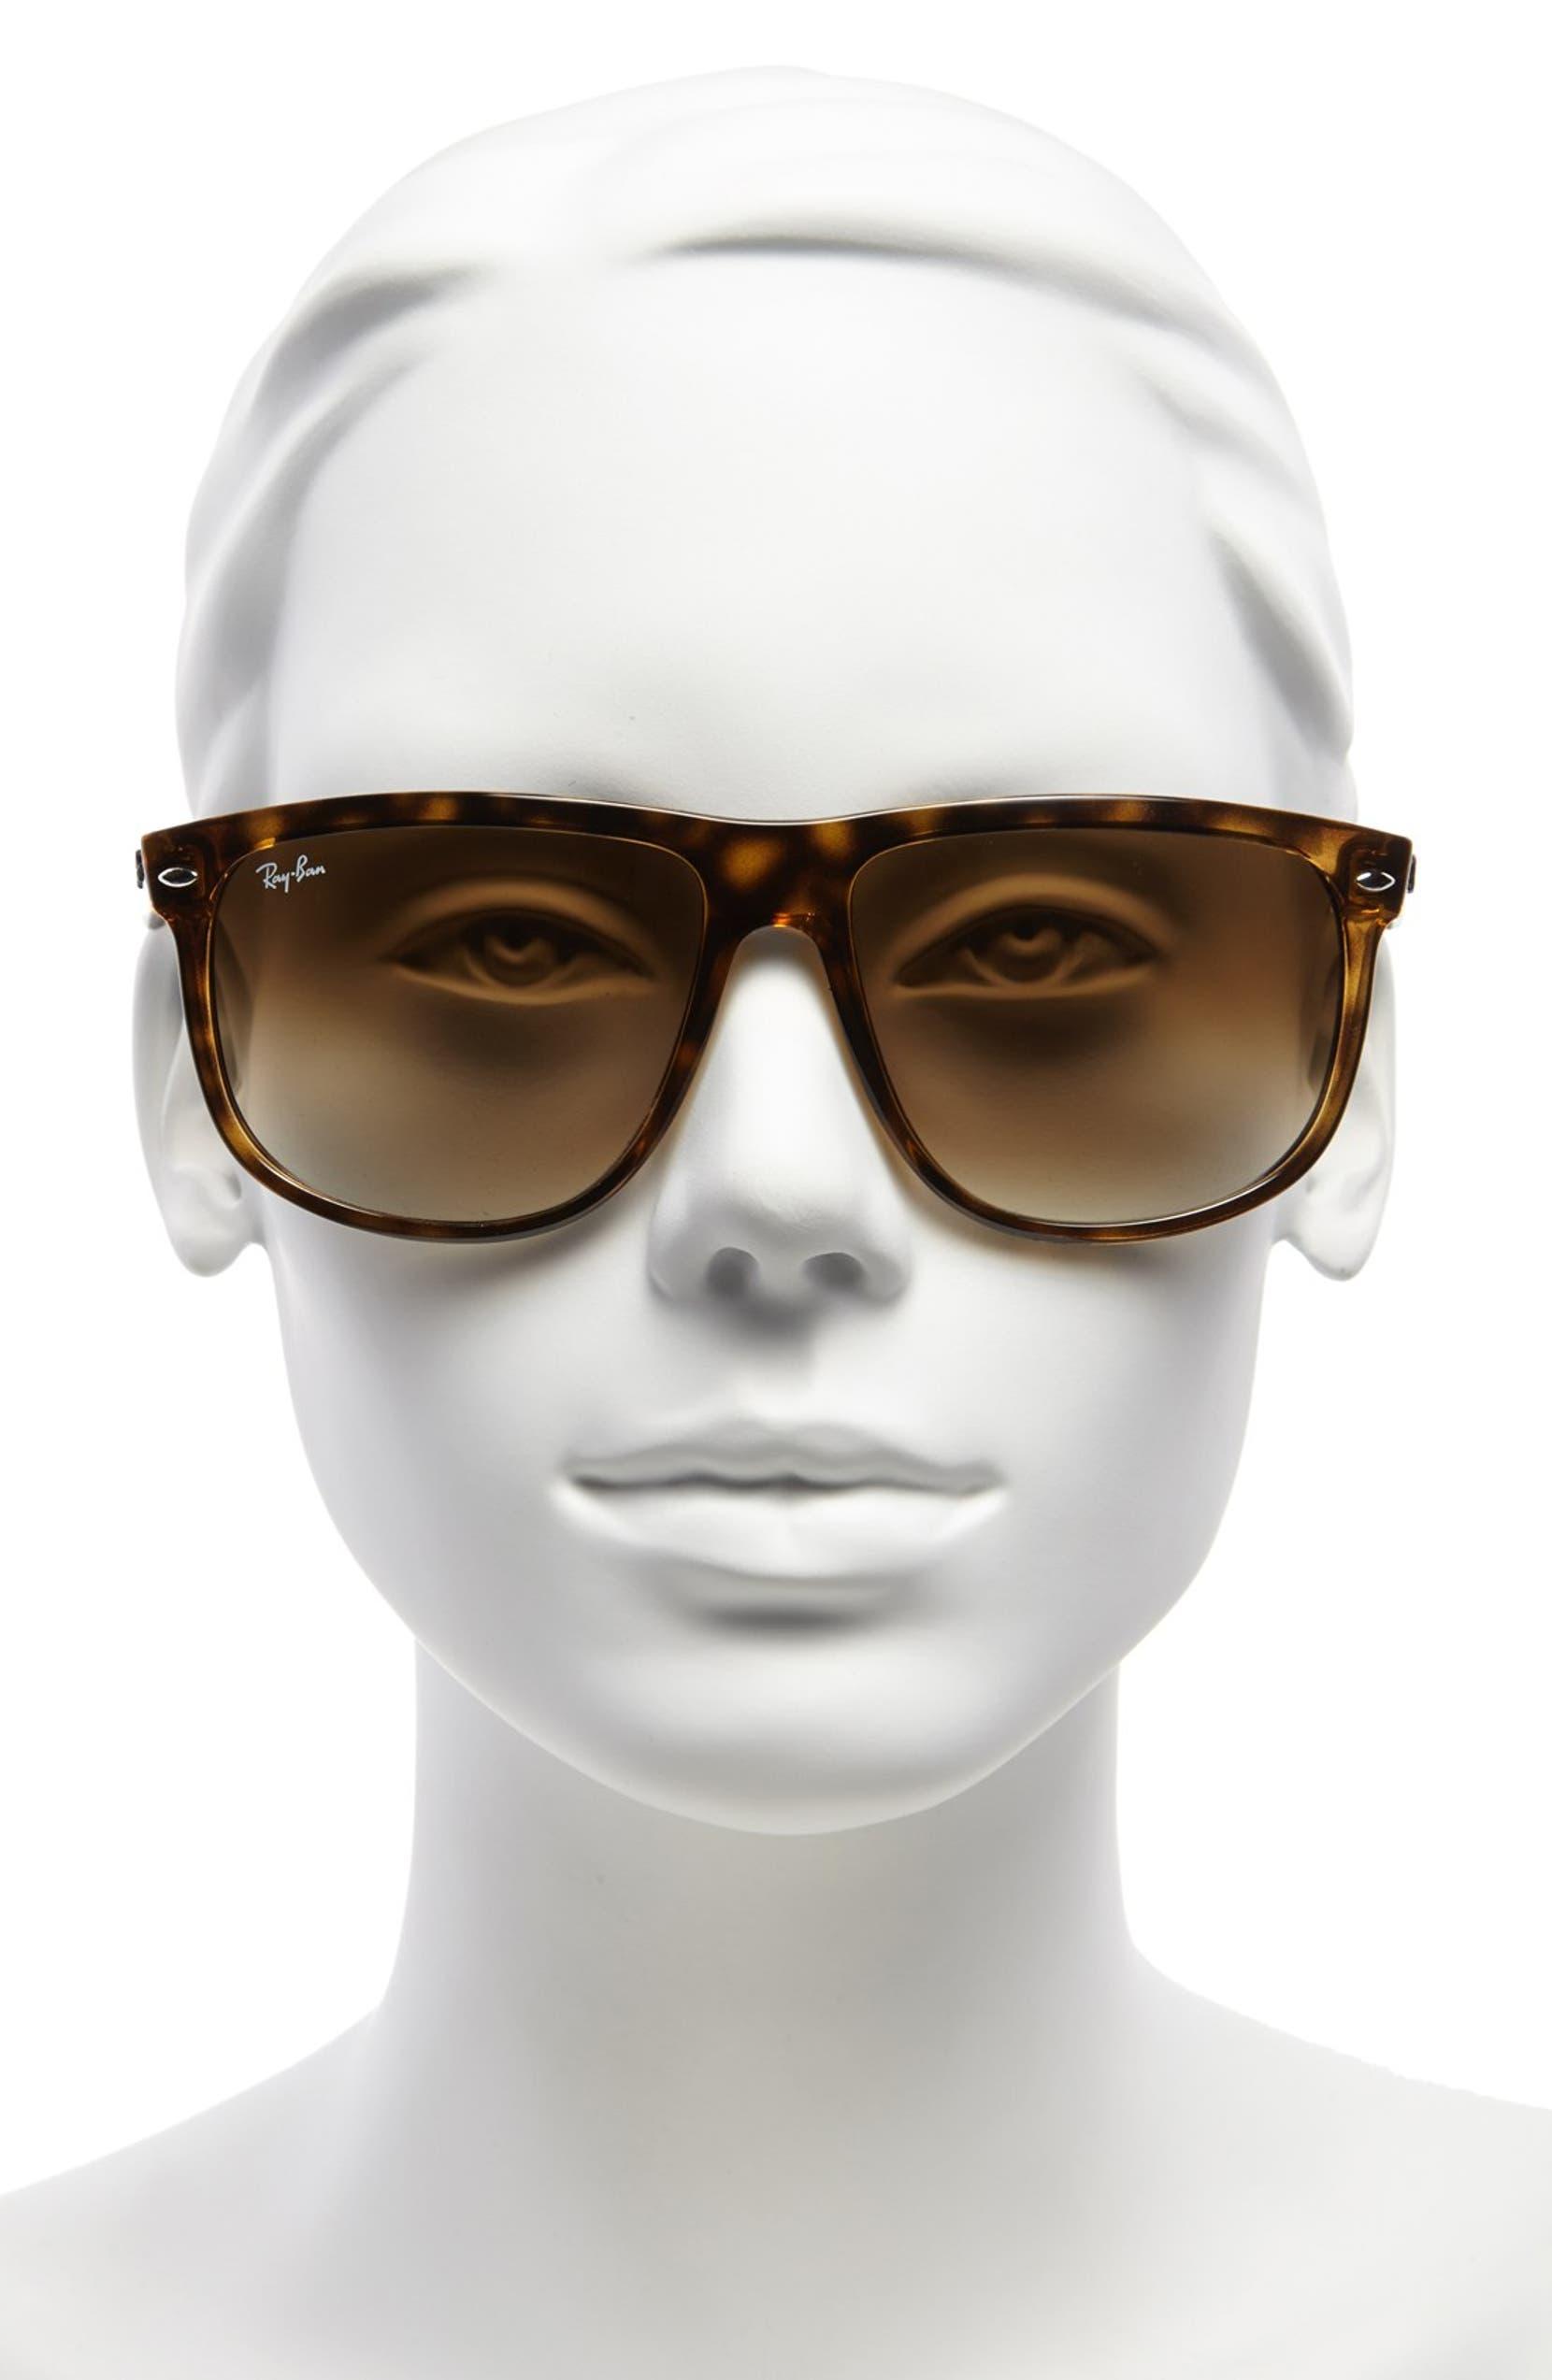 9c78860d31 Ray-Ban Boyfriend 60mm Flat Top Sunglasses